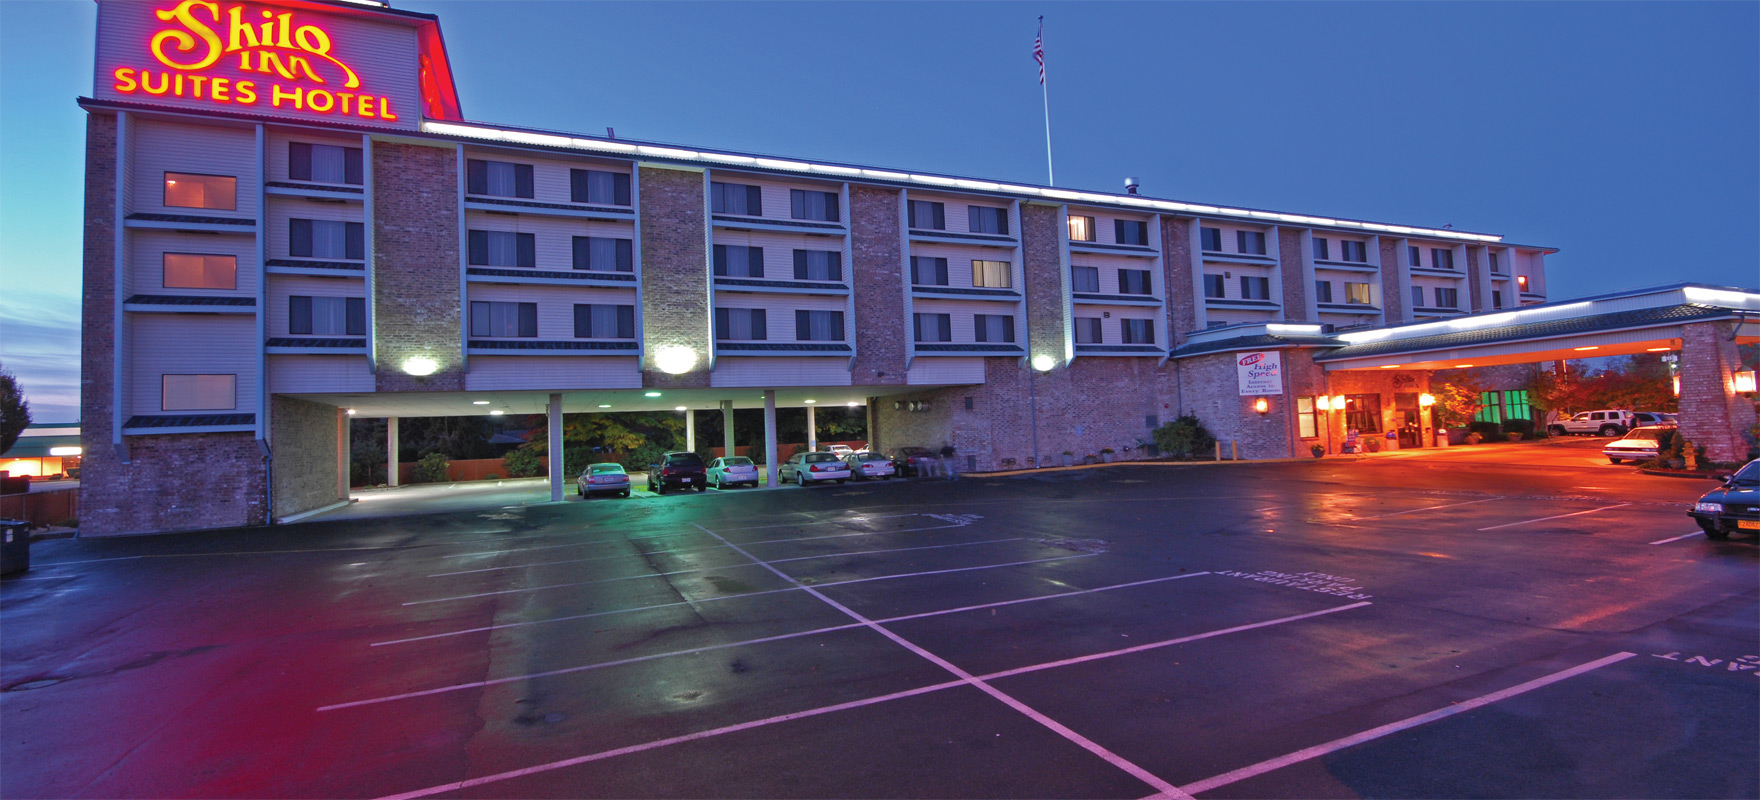 Shilo Inns Suites Hotels Salem Oregon